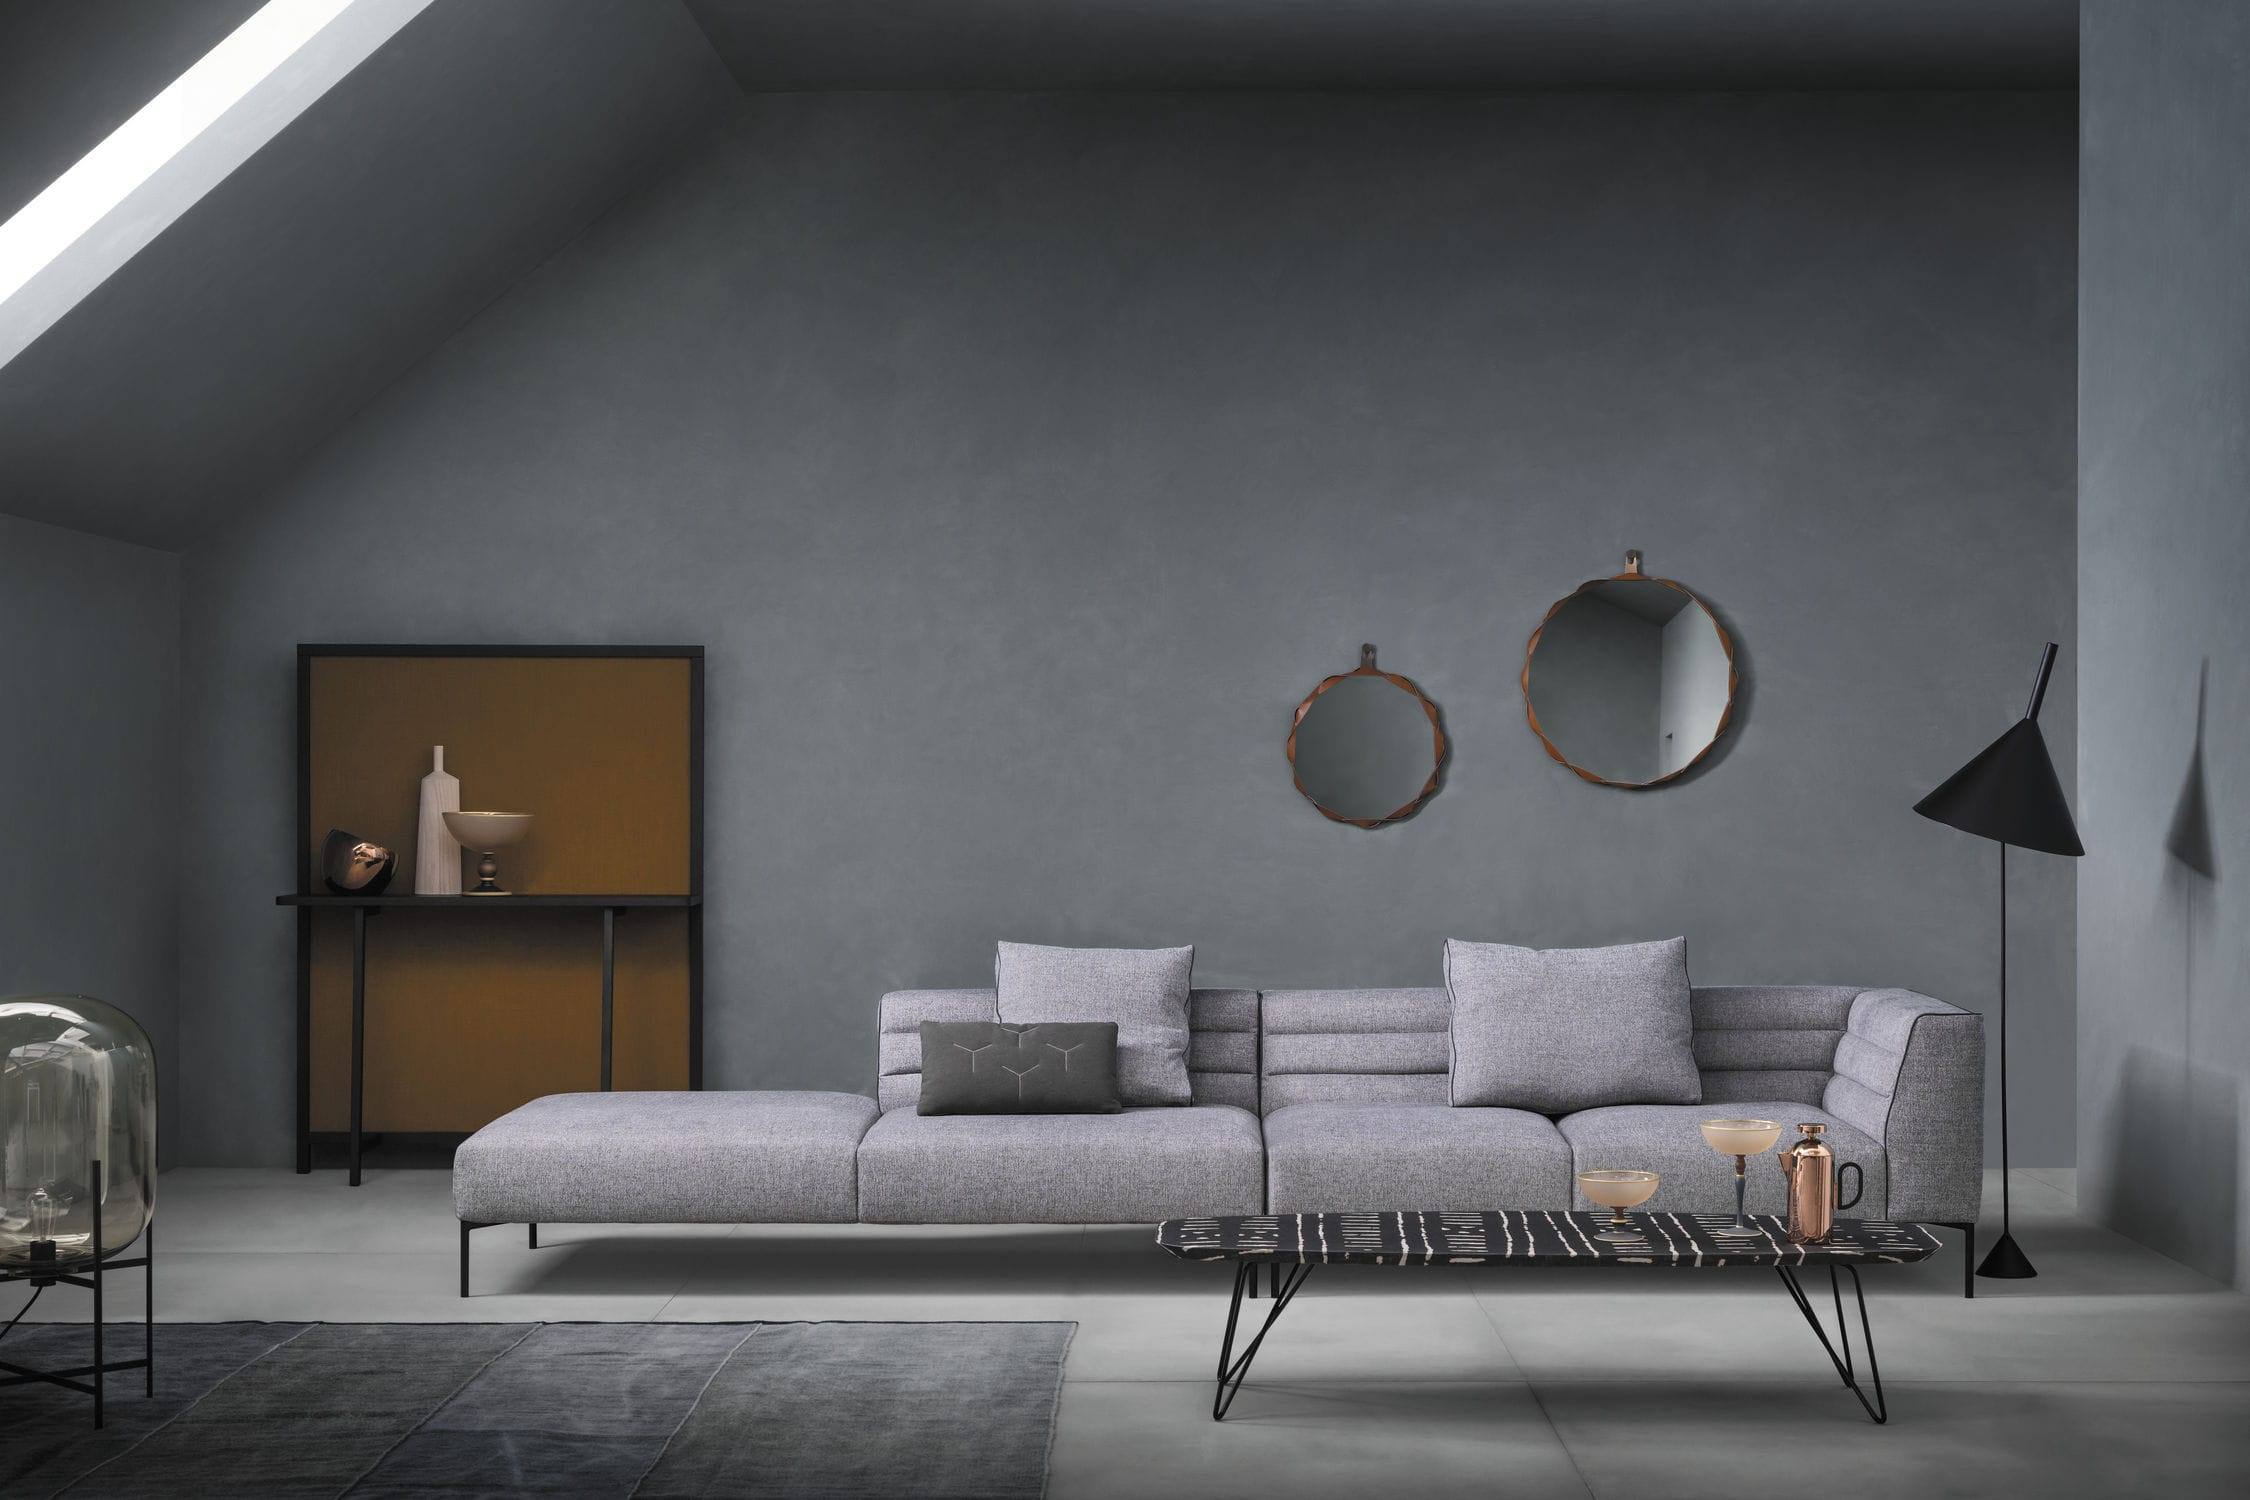 zanotta dedirekteurswoning. Black Bedroom Furniture Sets. Home Design Ideas